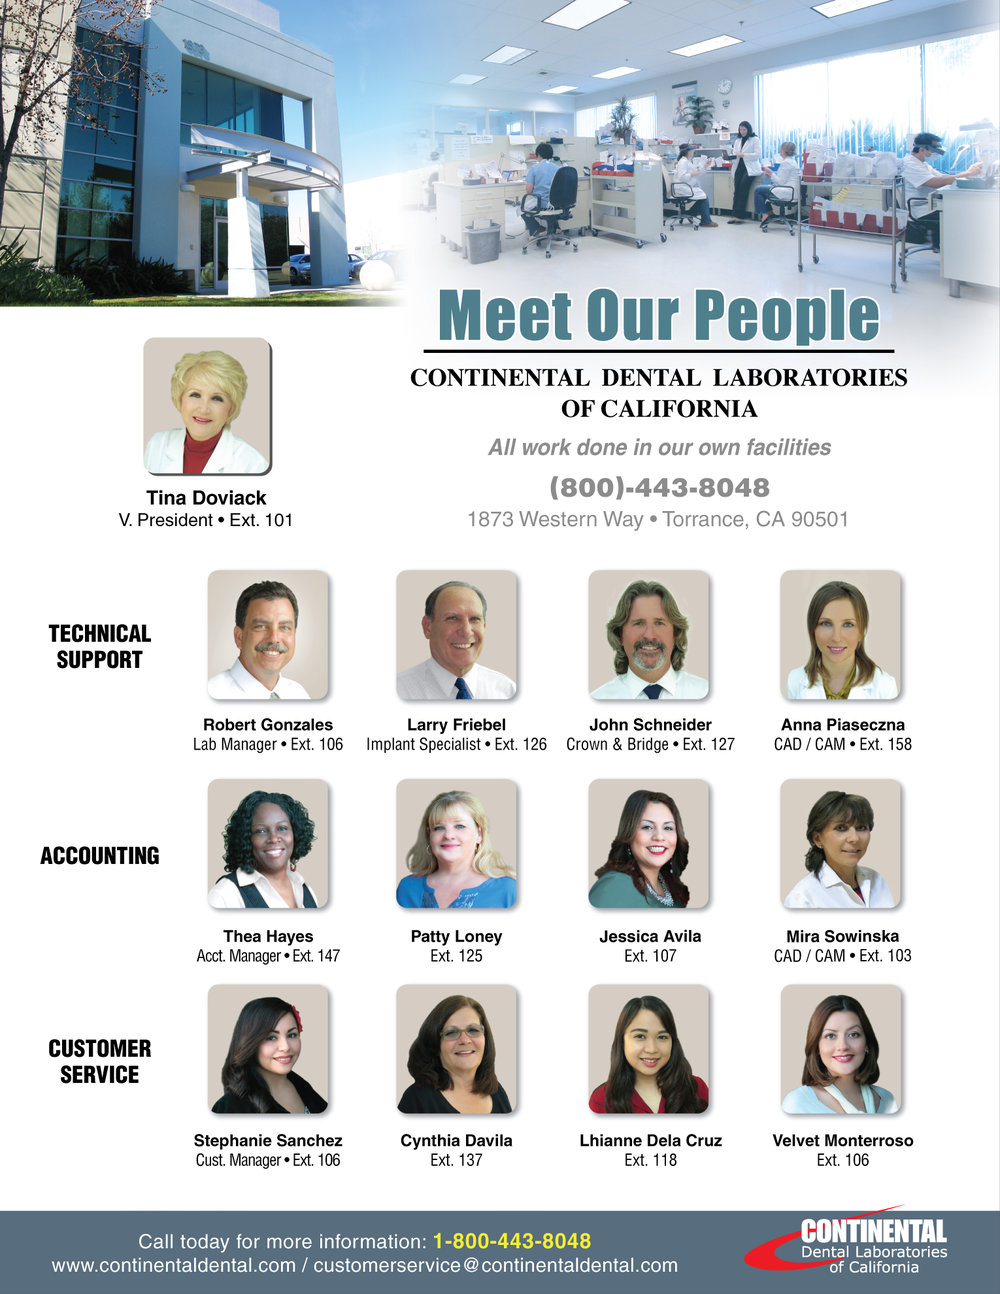 CDL_Flyer_Meet_Our_People_111017.jpg